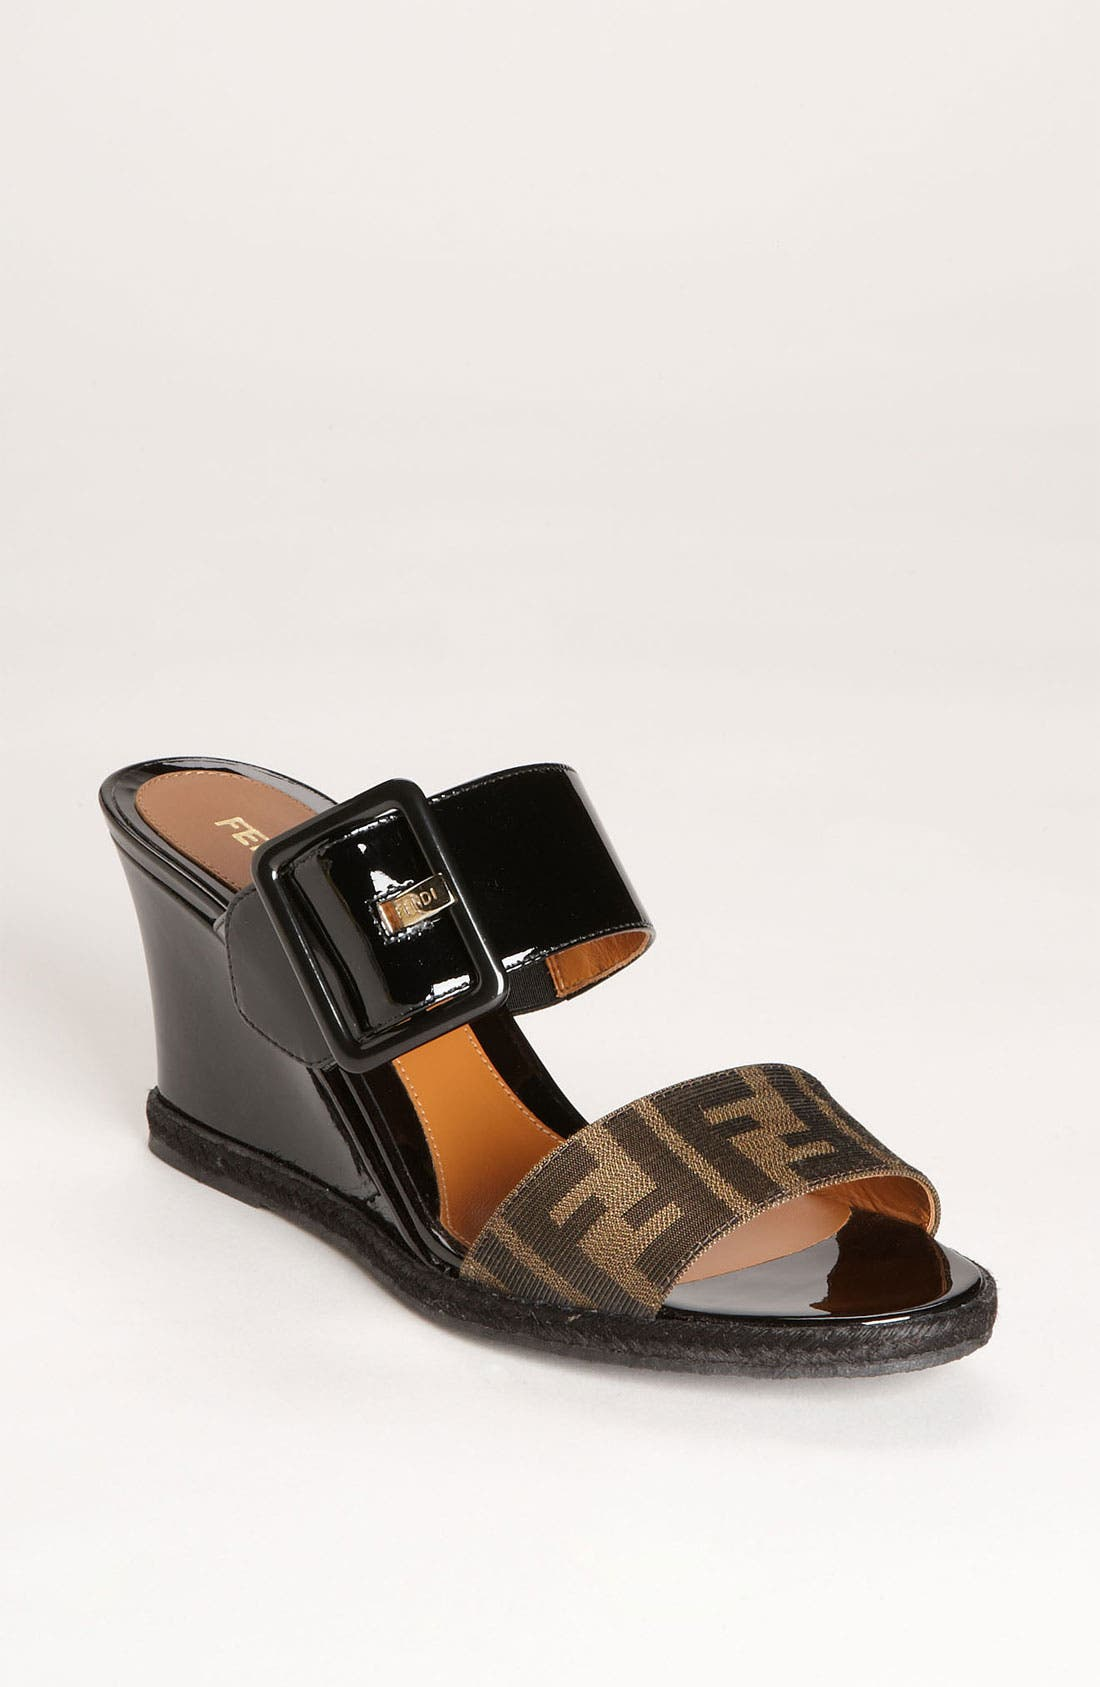 Main Image - Fendi 'Vernis' Wedge Sandal (Women)